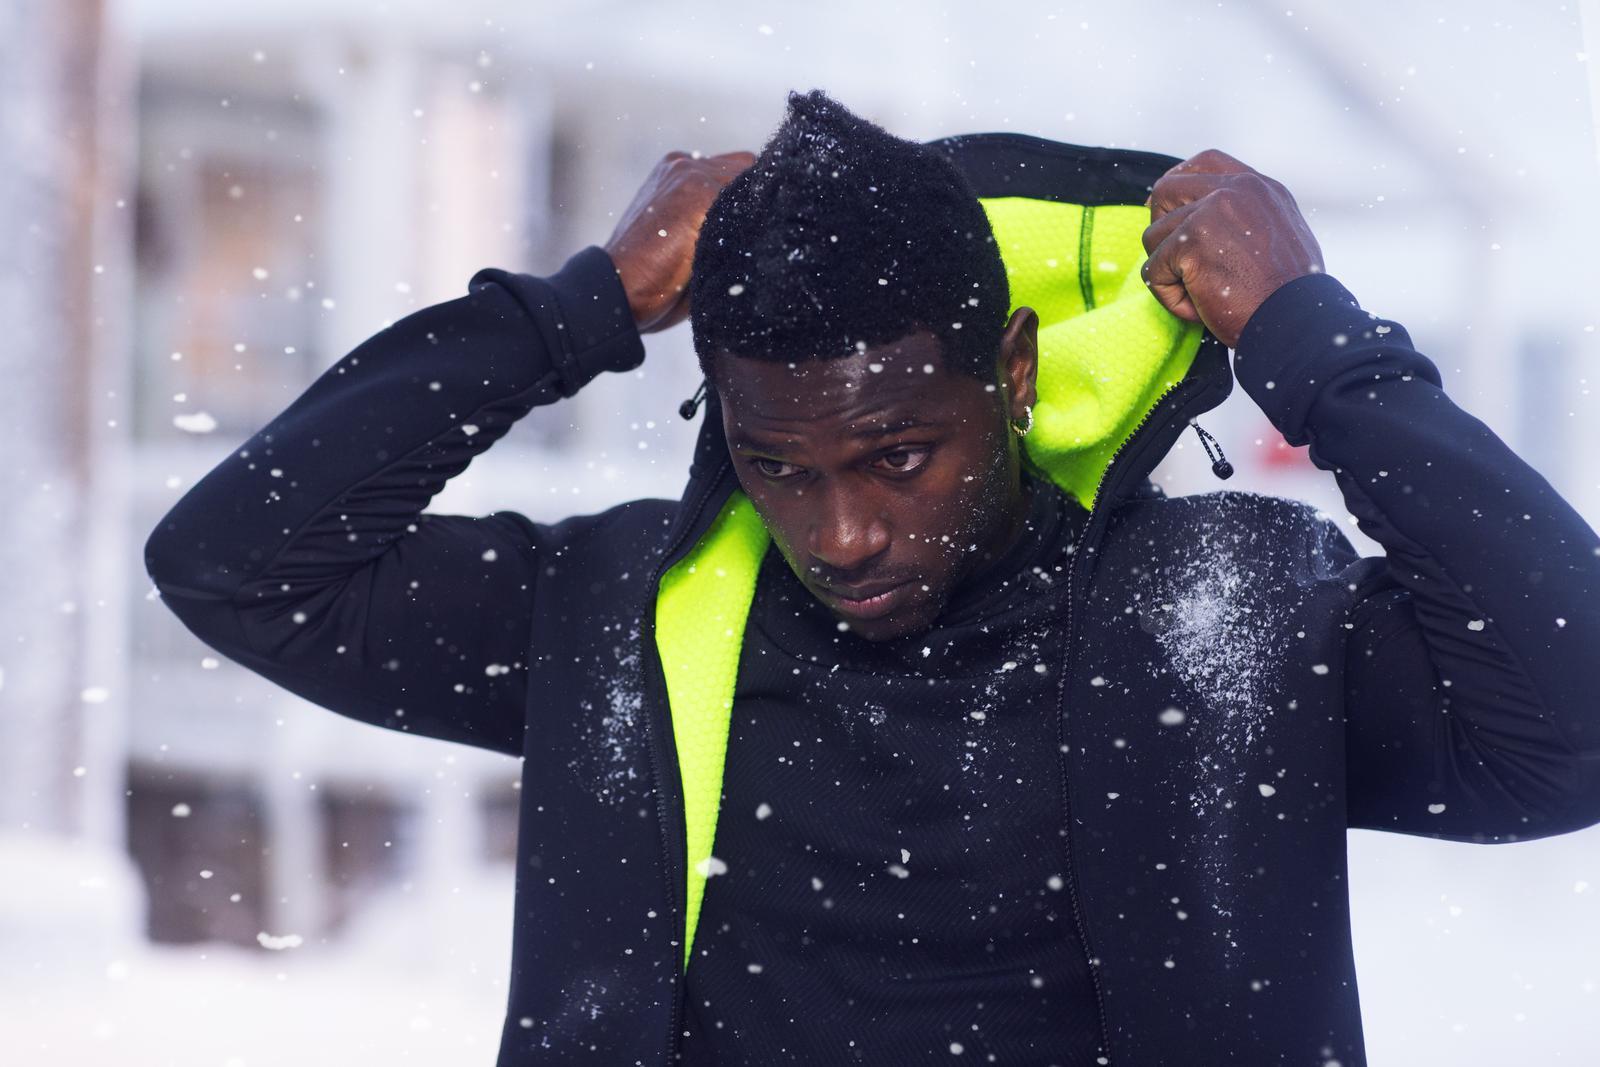 """Snow Day"" Film Kicks Off Nike's #GetOutHere Winter"